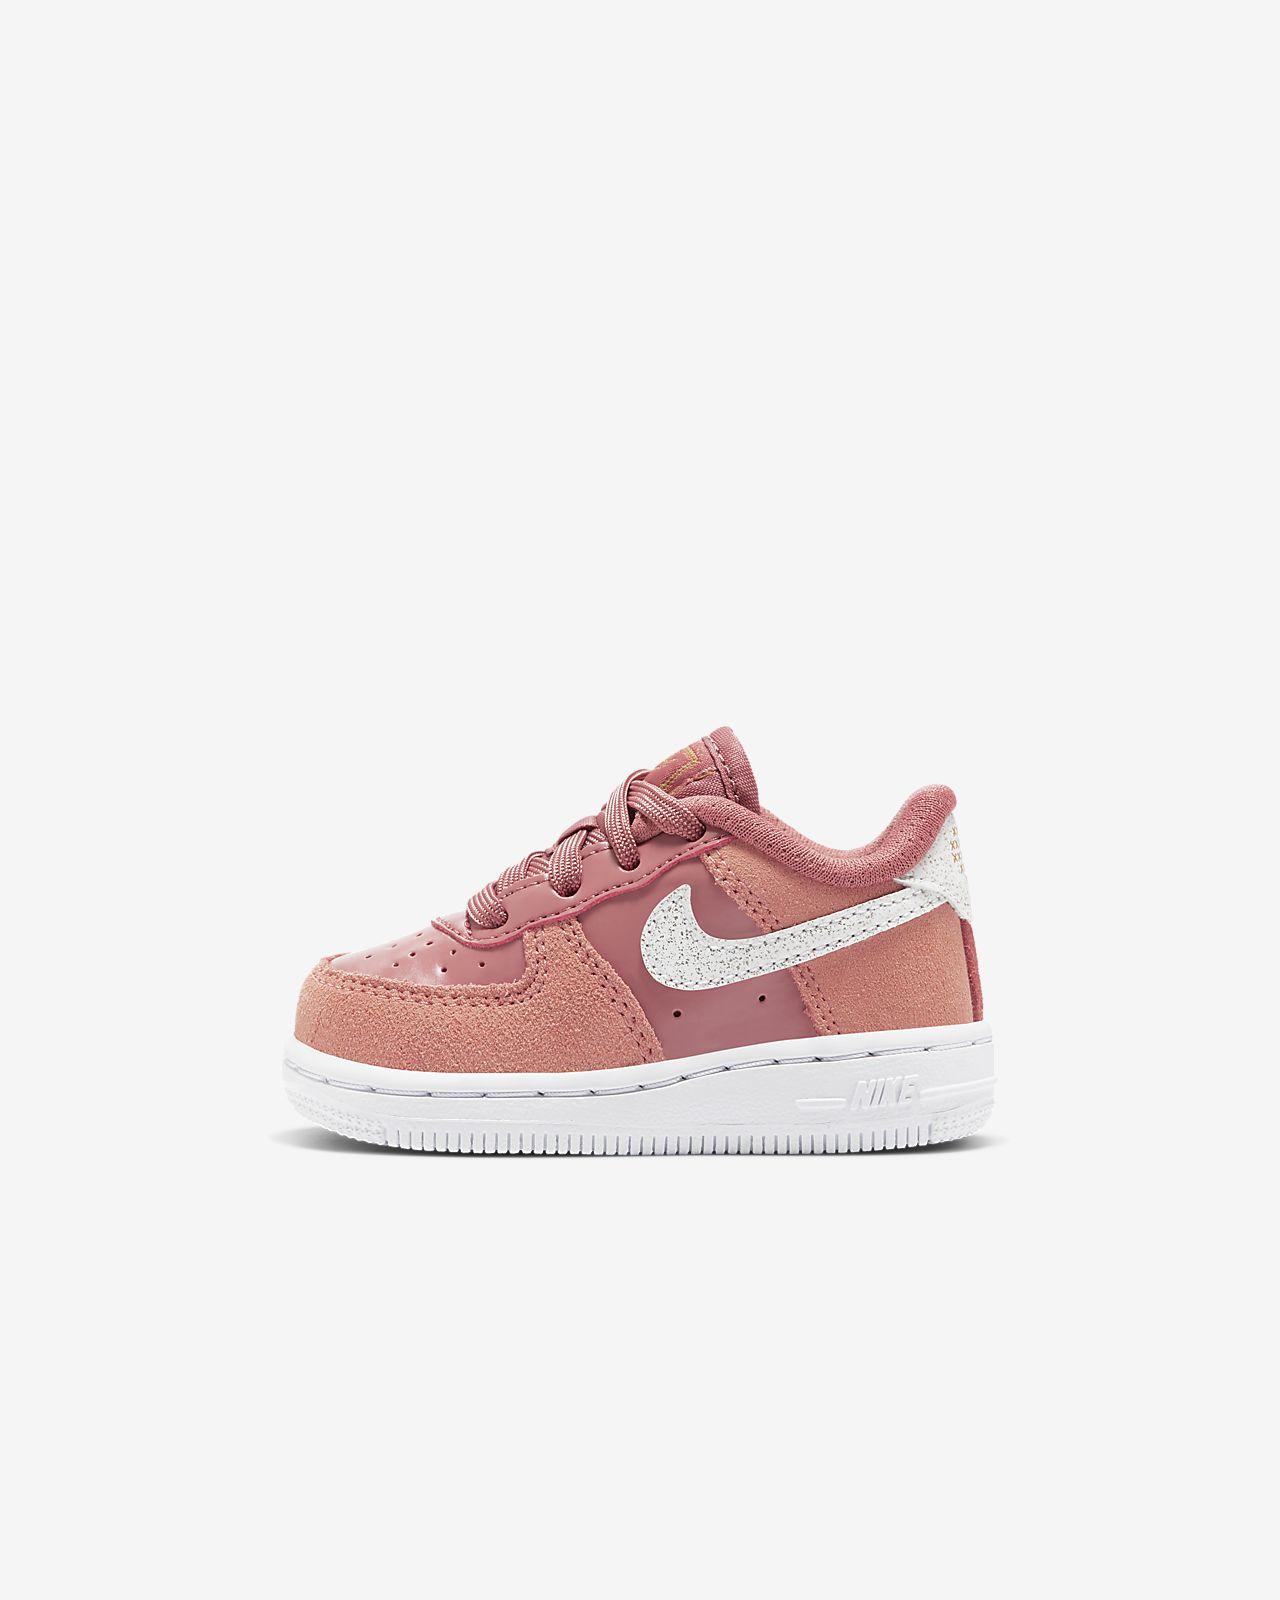 Nike Force 1 LV8 情人節嬰幼兒鞋款